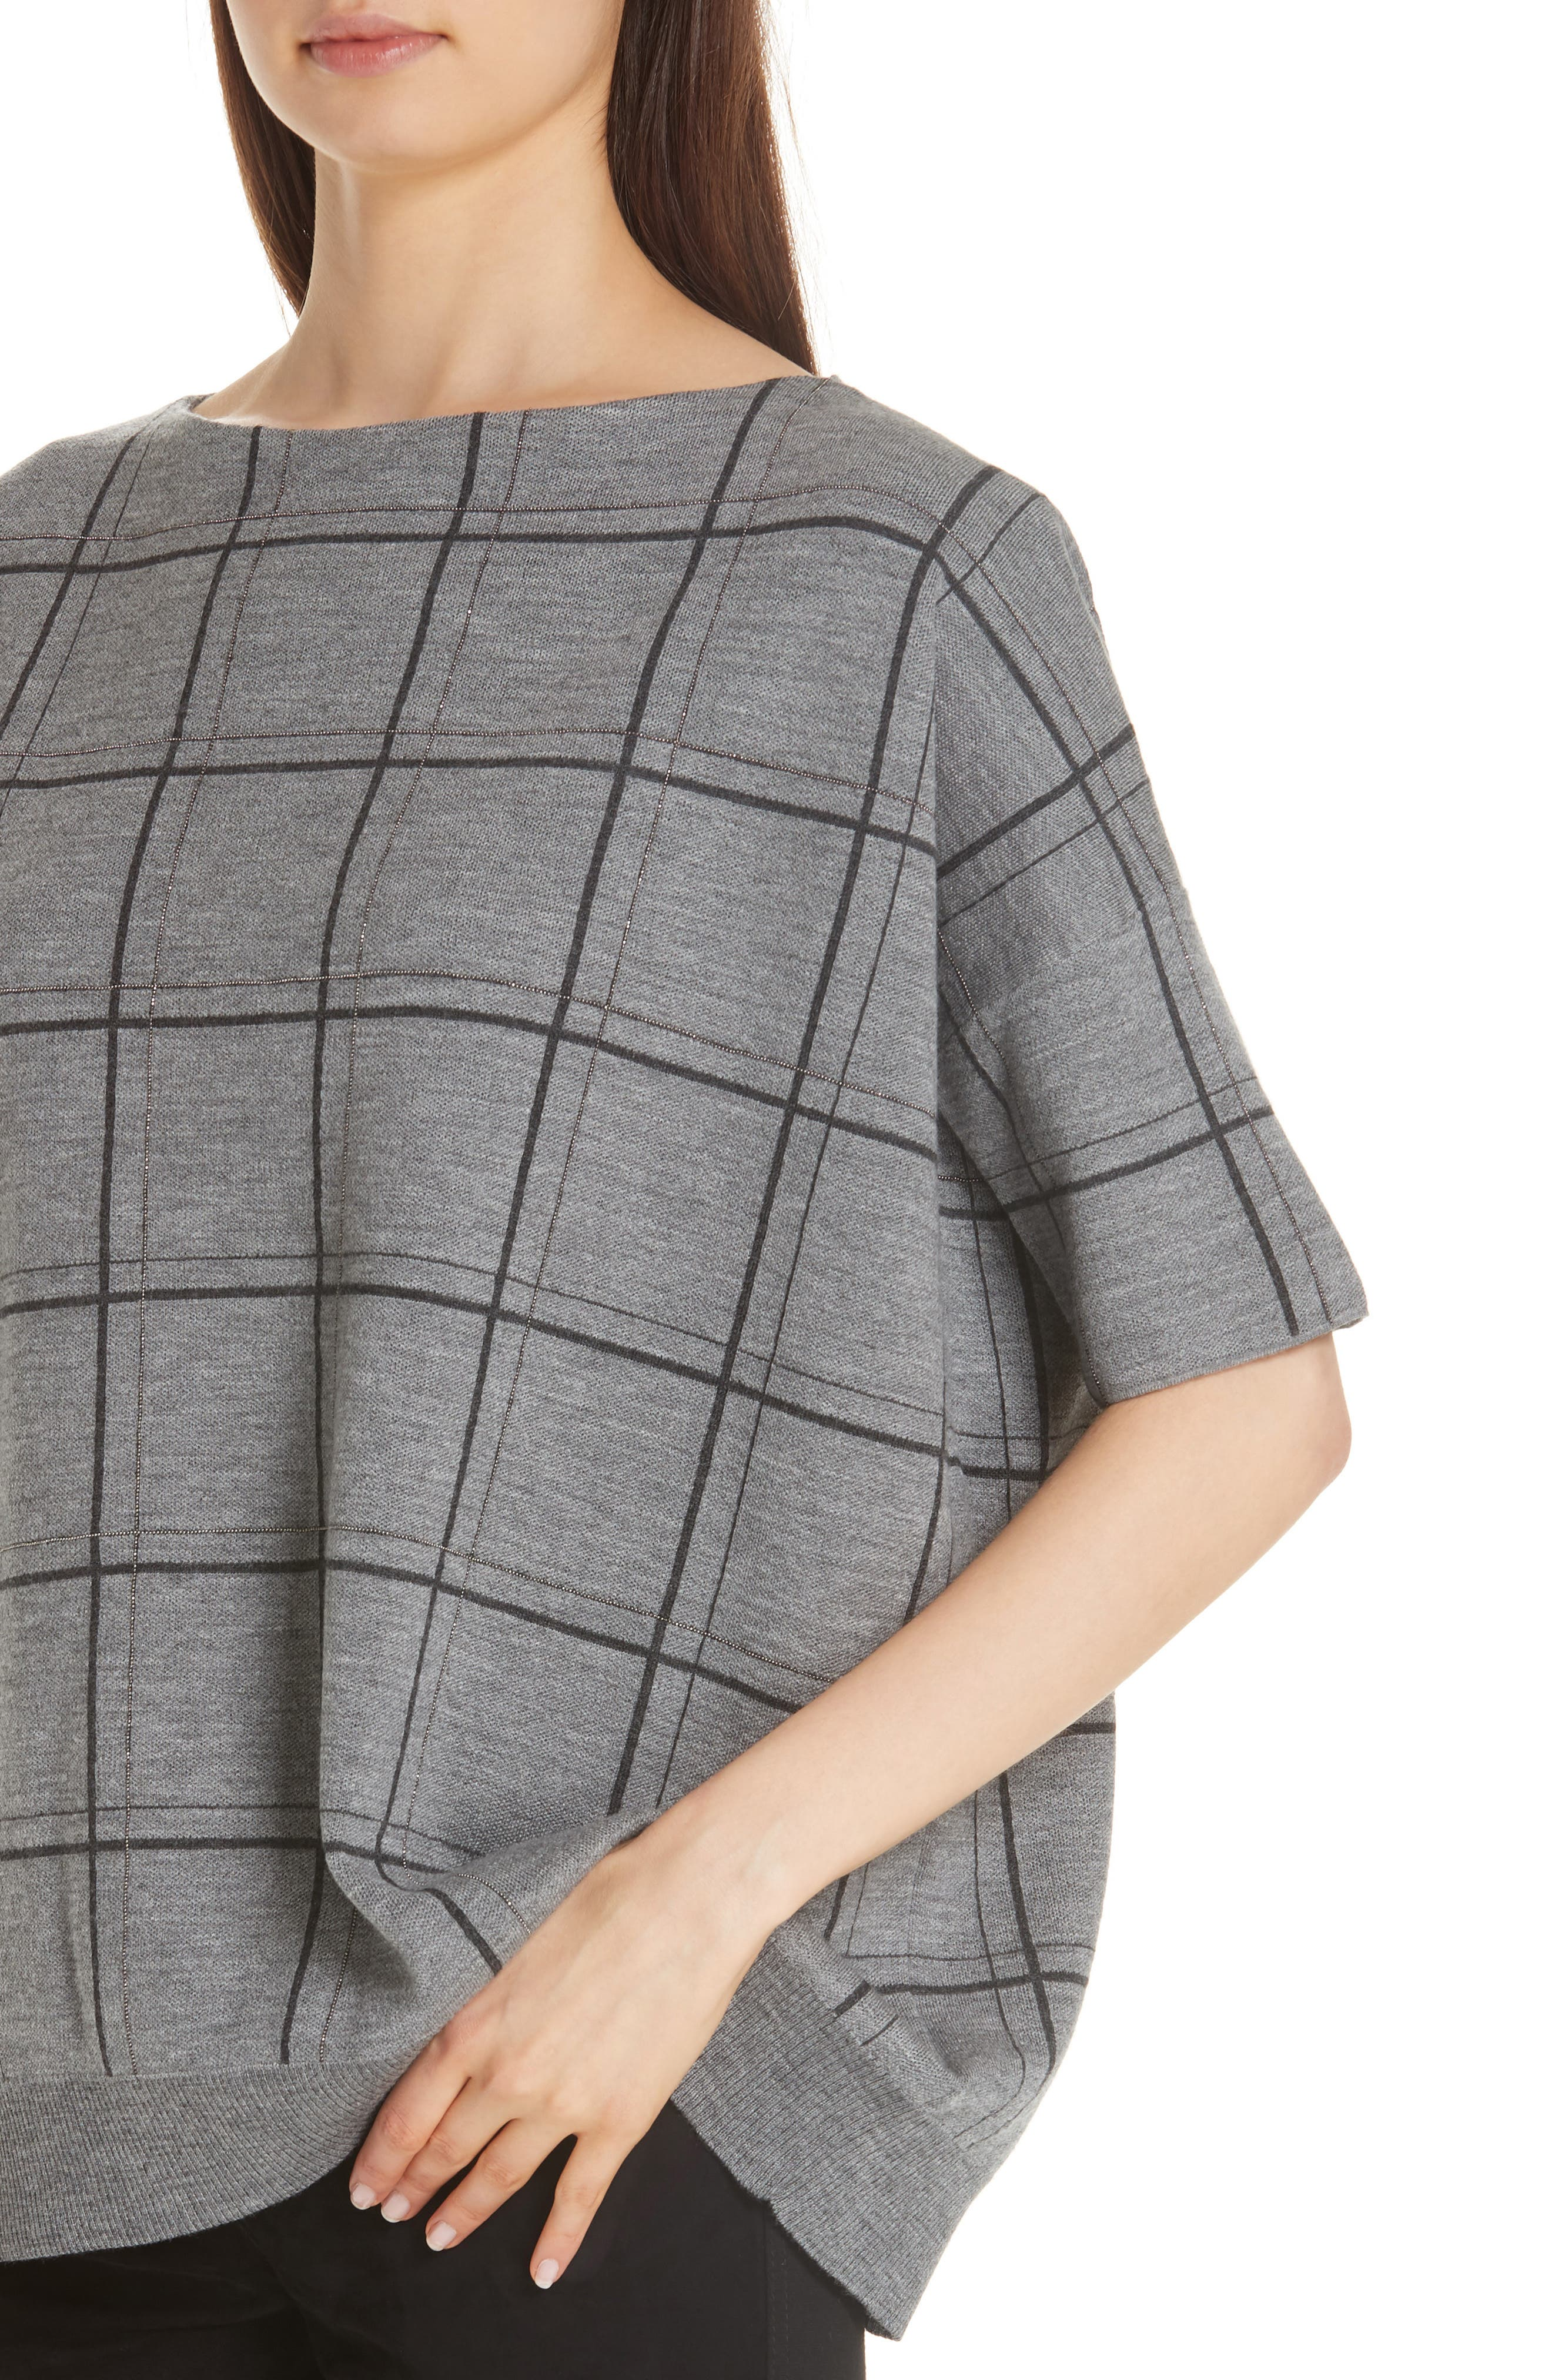 LAFAYETTE 148 NEW YORK,                             Chain Embellished Oversize Jacquard Sweater,                             Alternate thumbnail 4, color,                             056